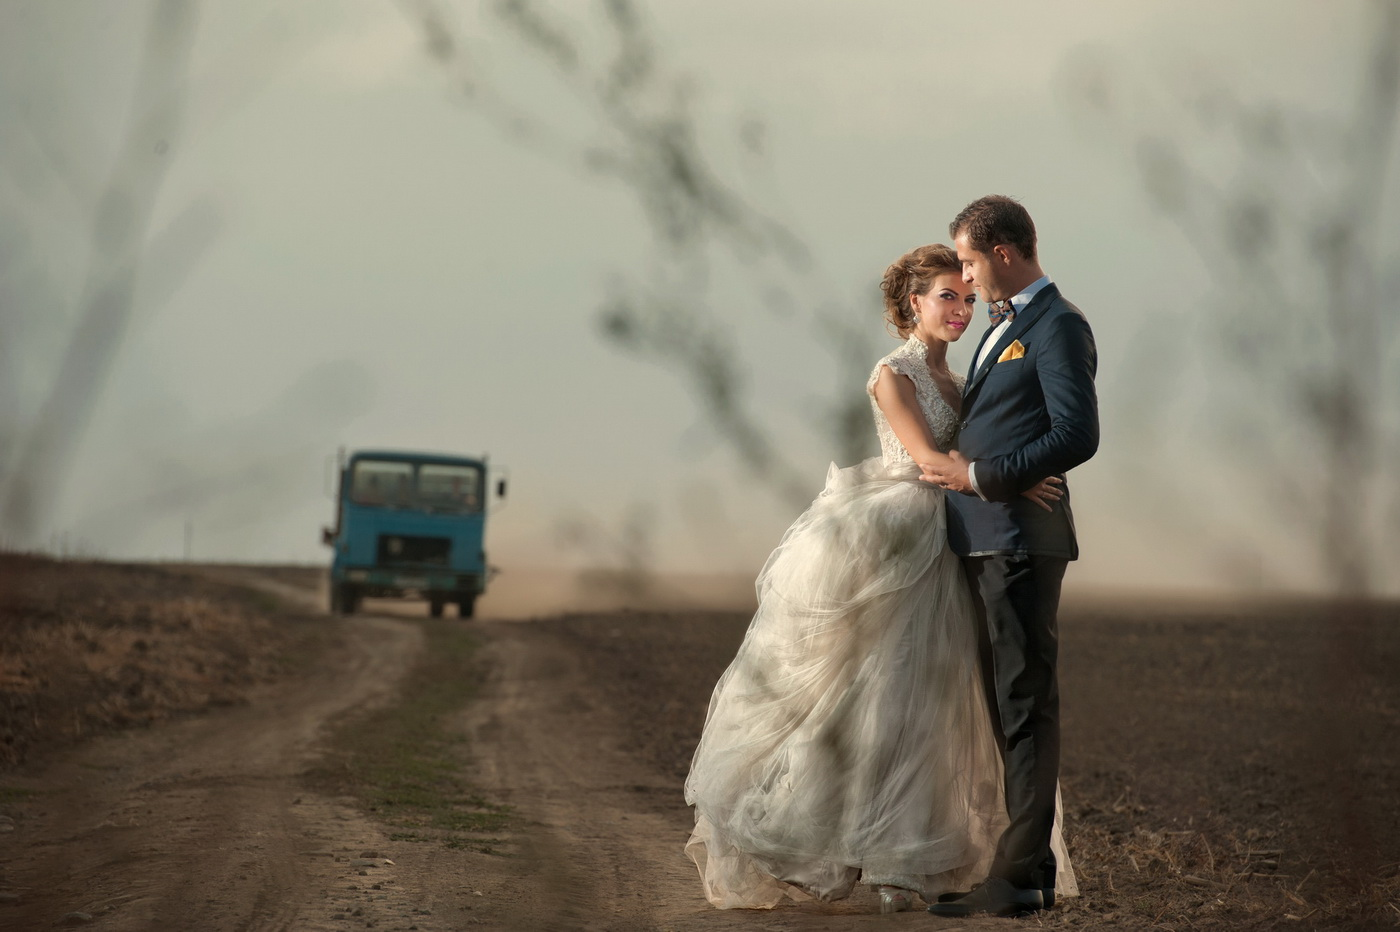 Destination Wedding Photographer_Marian Sterea_011.jpg